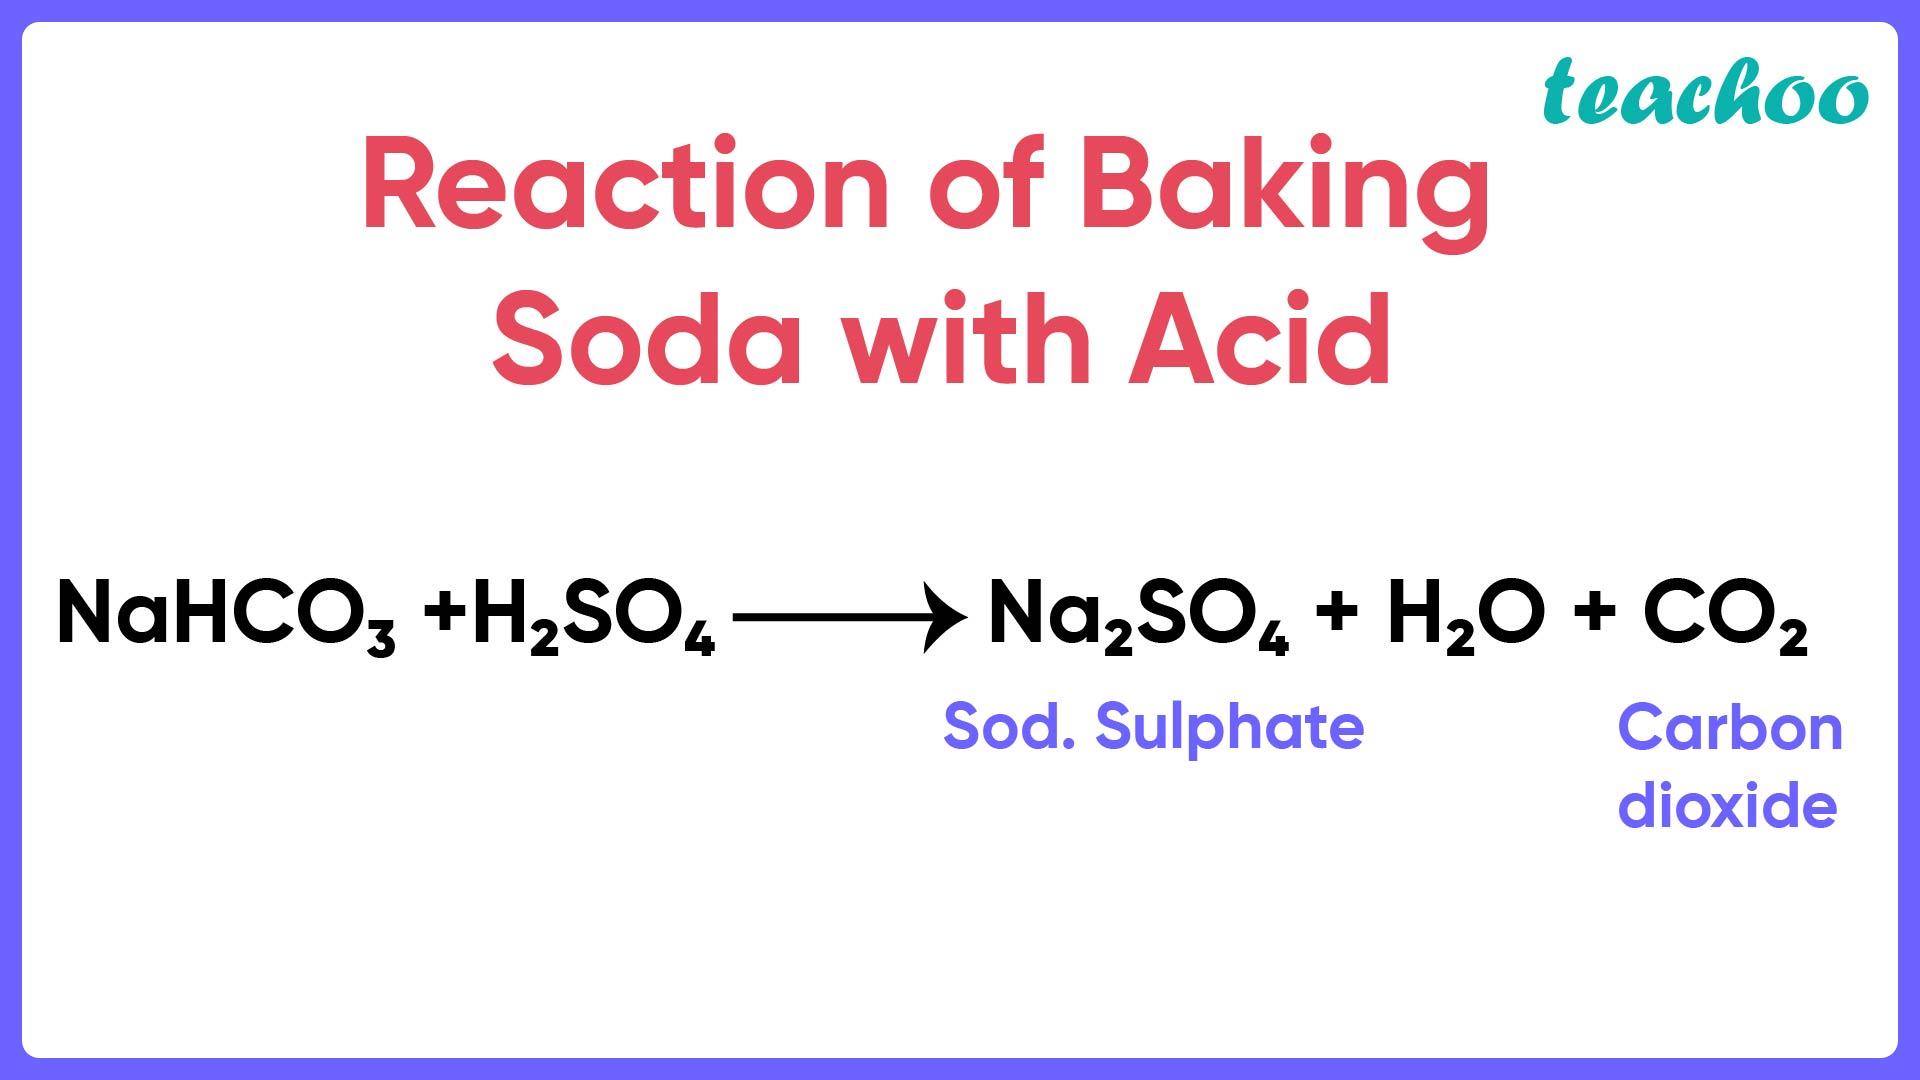 Reaction of Baking Soda with Acid - Teachoo.jpg